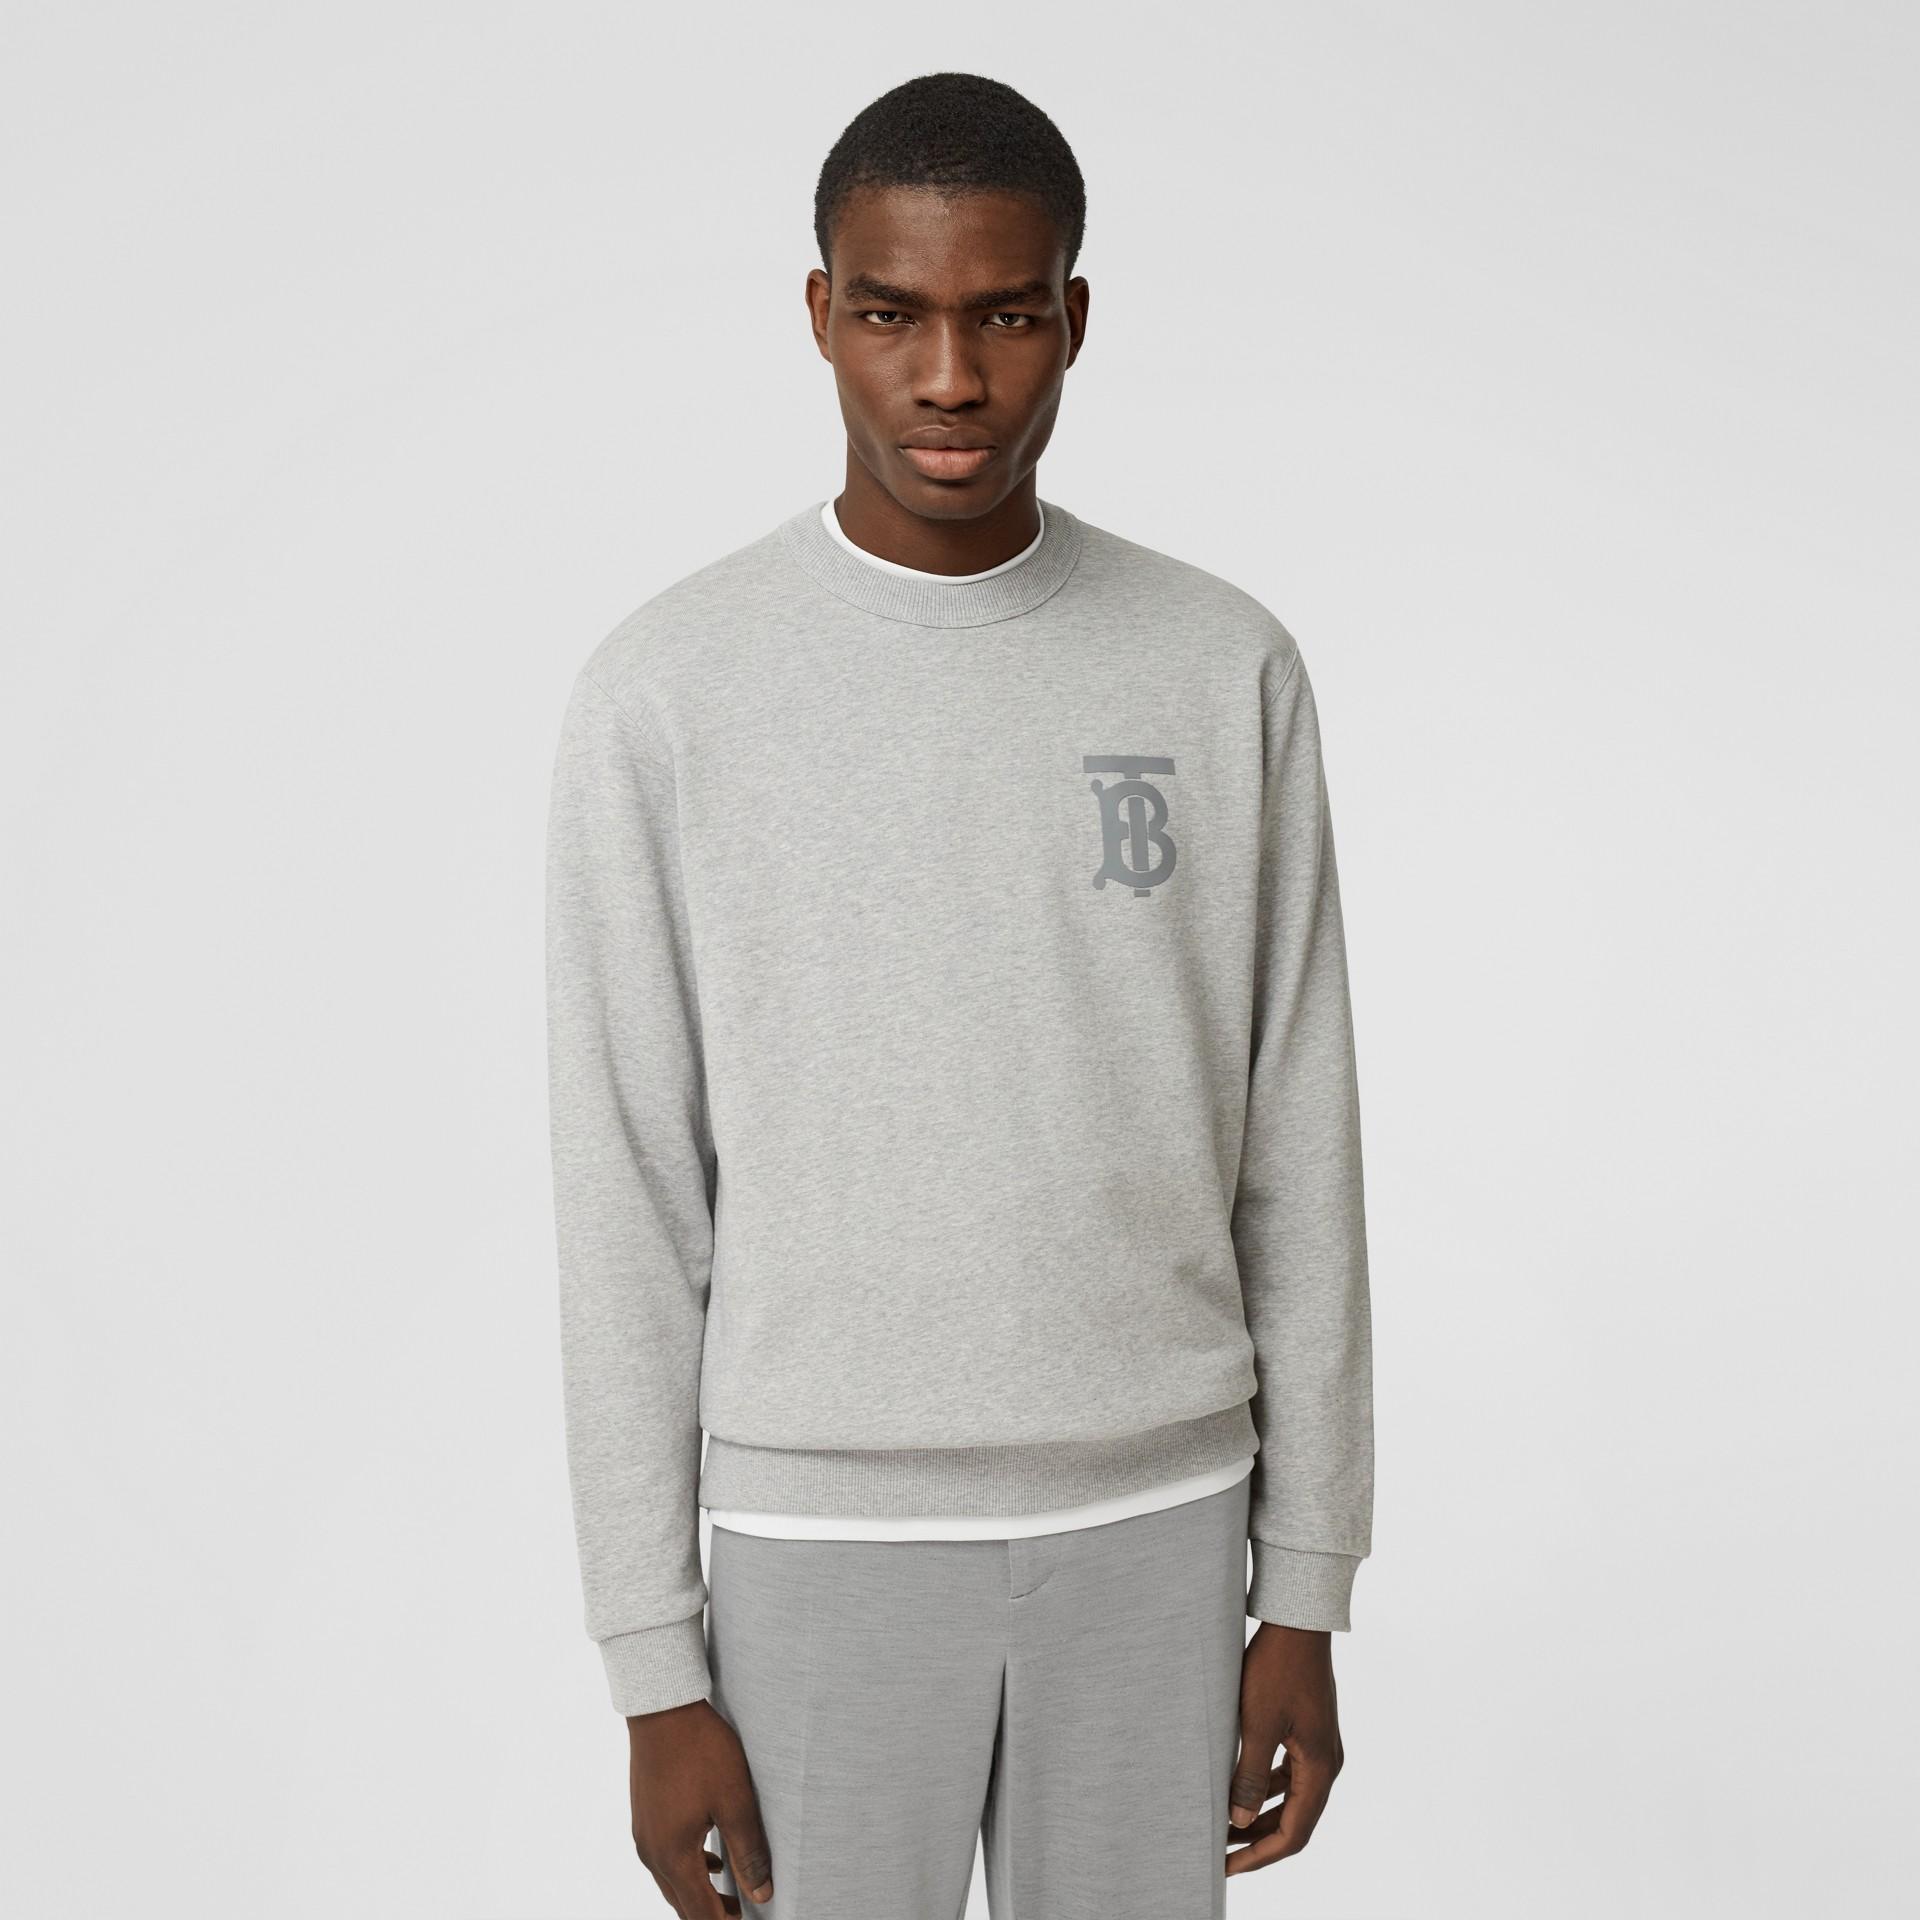 Monogram Motif Cotton Sweatshirt in Pale Grey Melange - Men | Burberry United Kingdom - gallery image 0